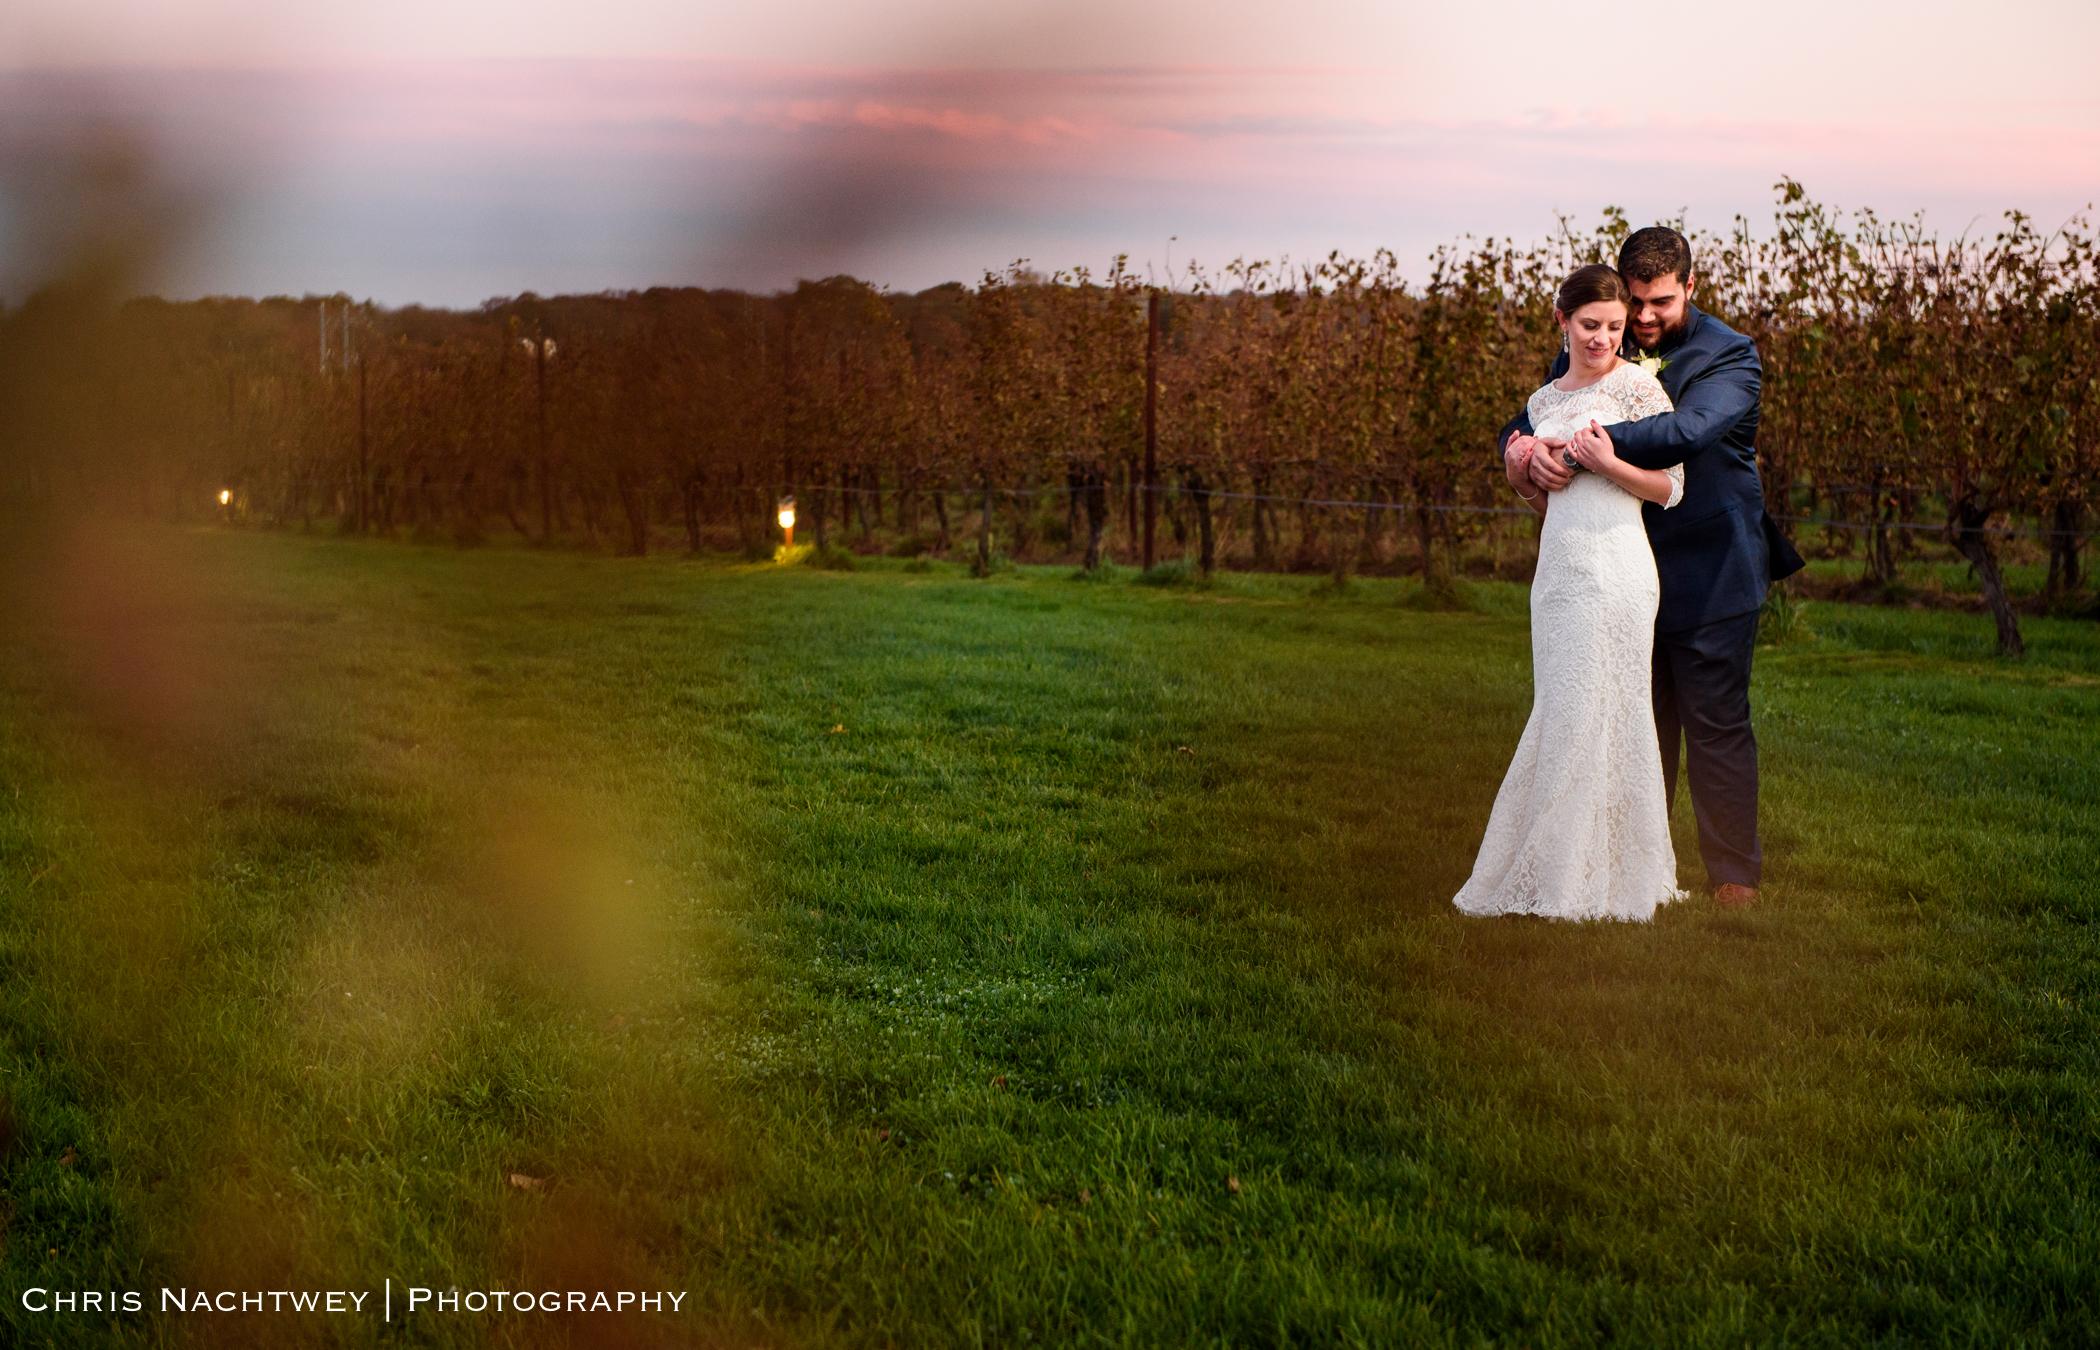 artistic-ct-wedding-photographers-chris-nachtwey-2017-6.jpg